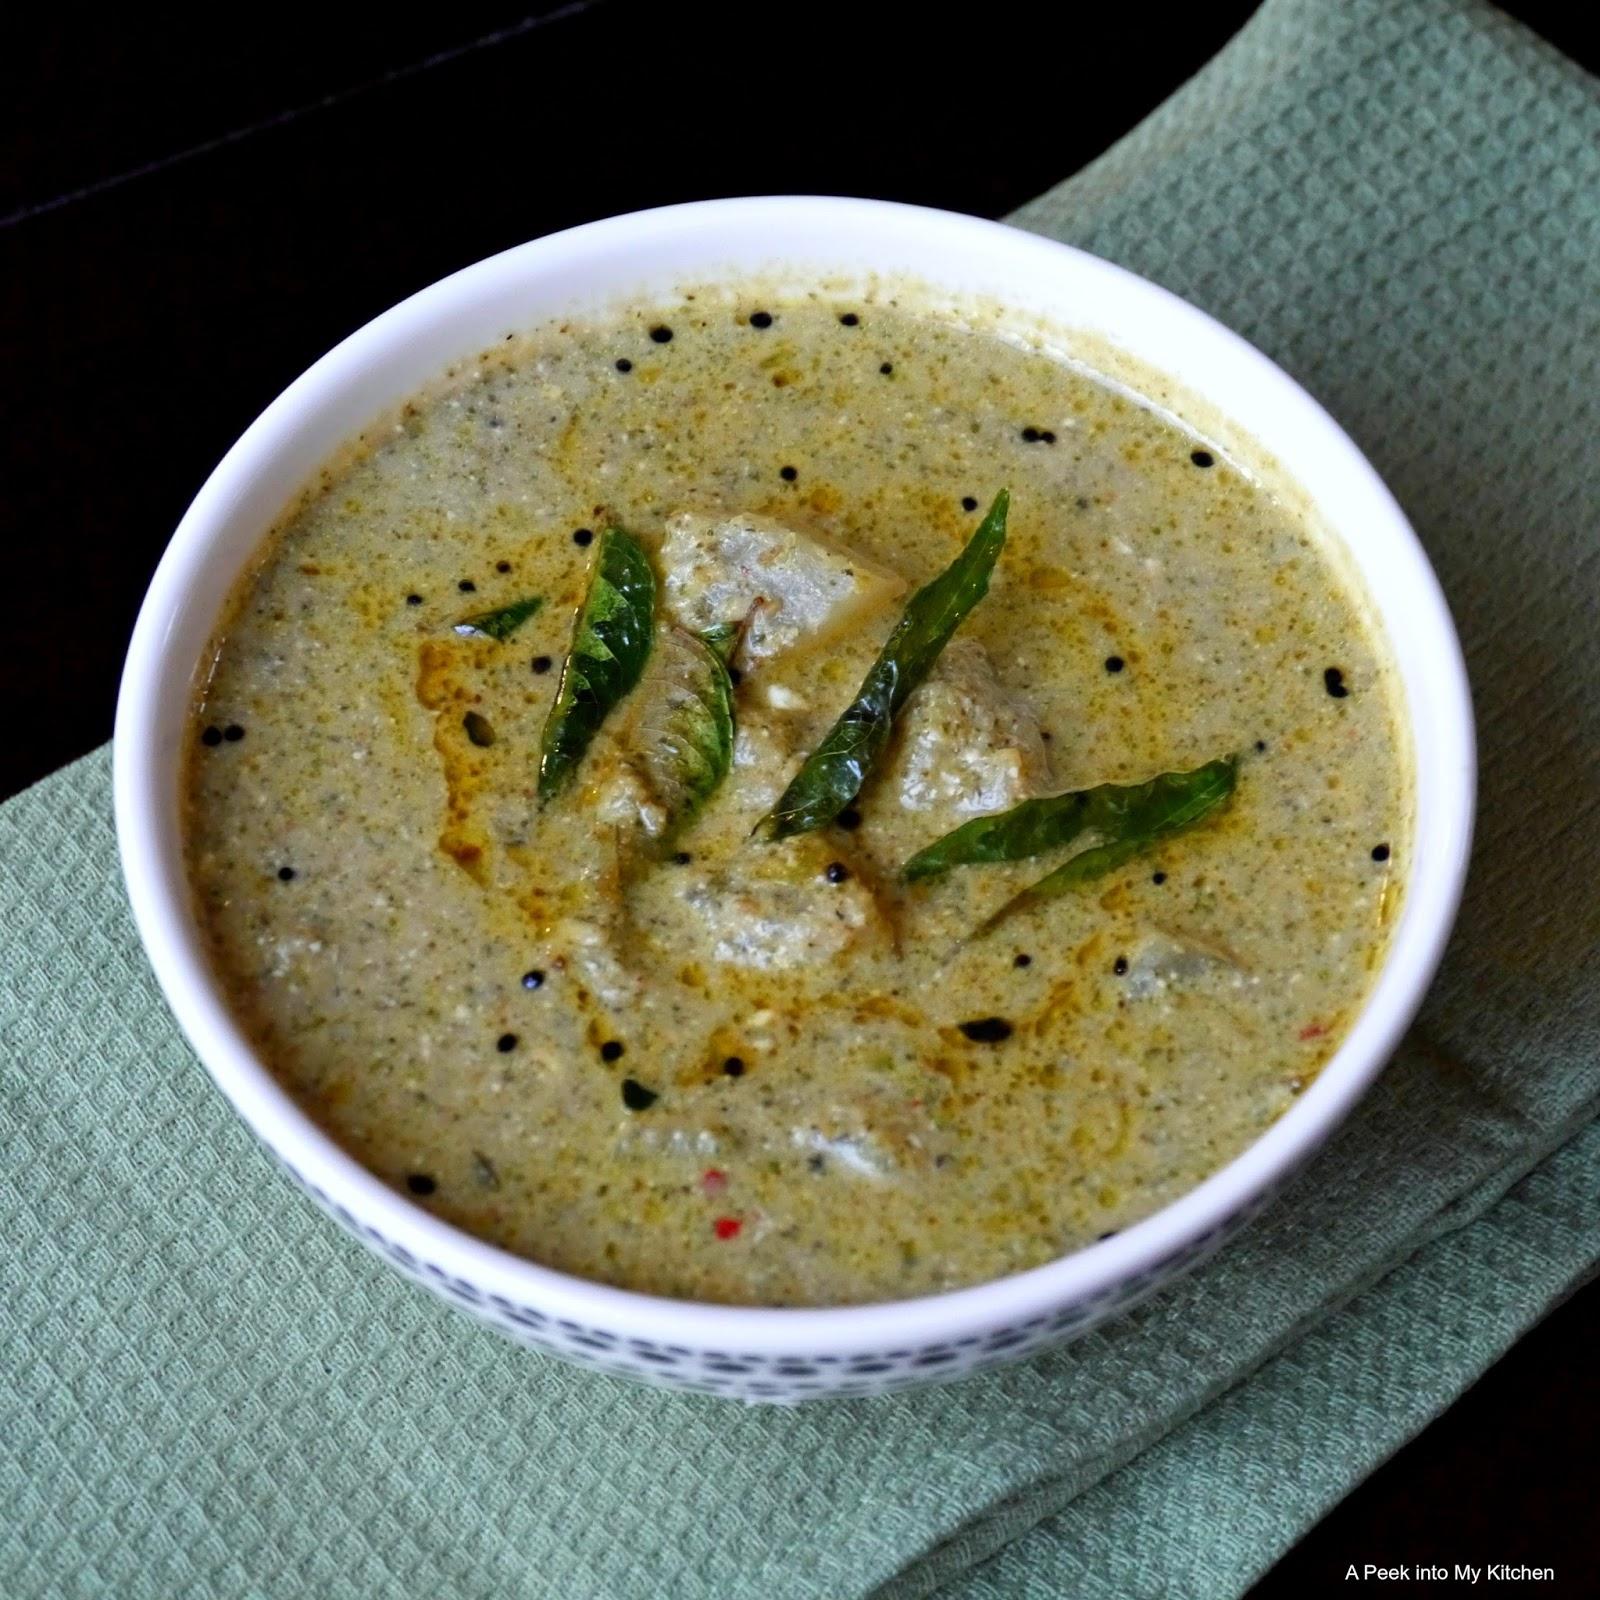 Best Cooking Method For Preserving Vitamins In Food